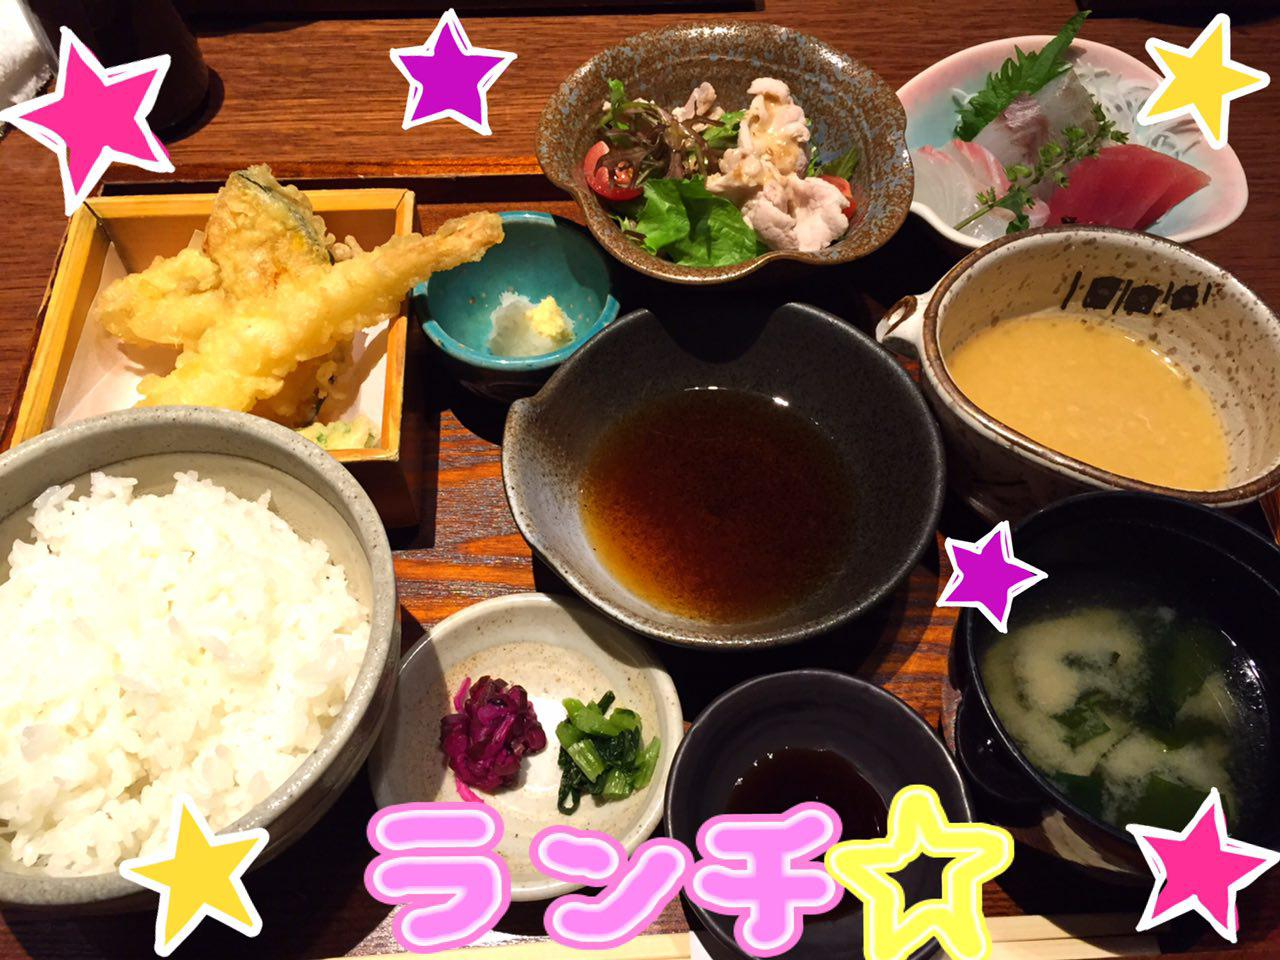 photo_2017-01-21_22-59-03.jpg